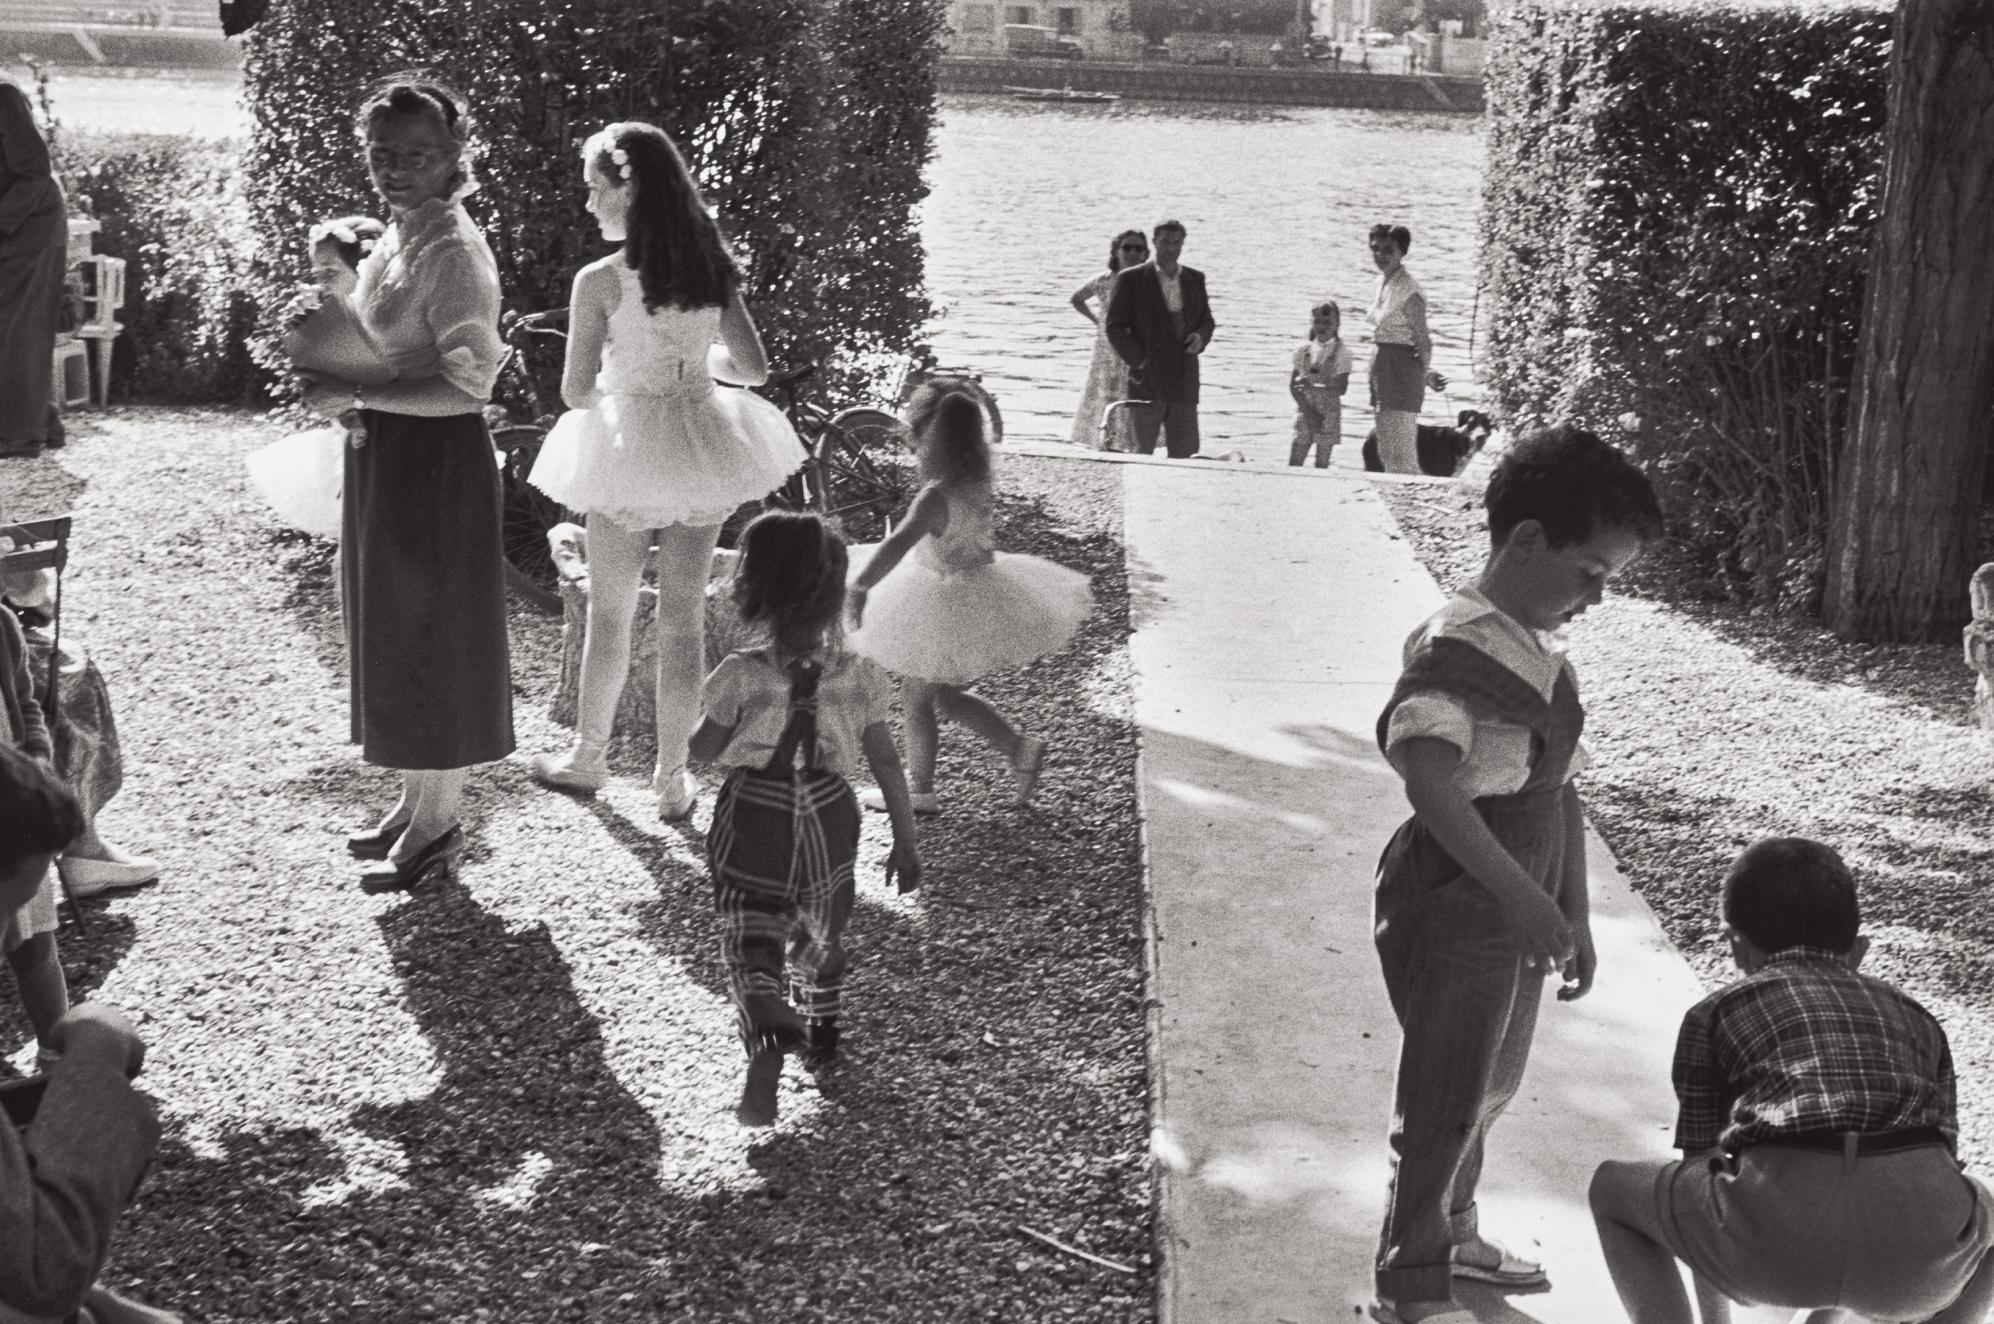 Henri Cartier-Bresson-Near Juvisy-Sur-Orge, France-1955